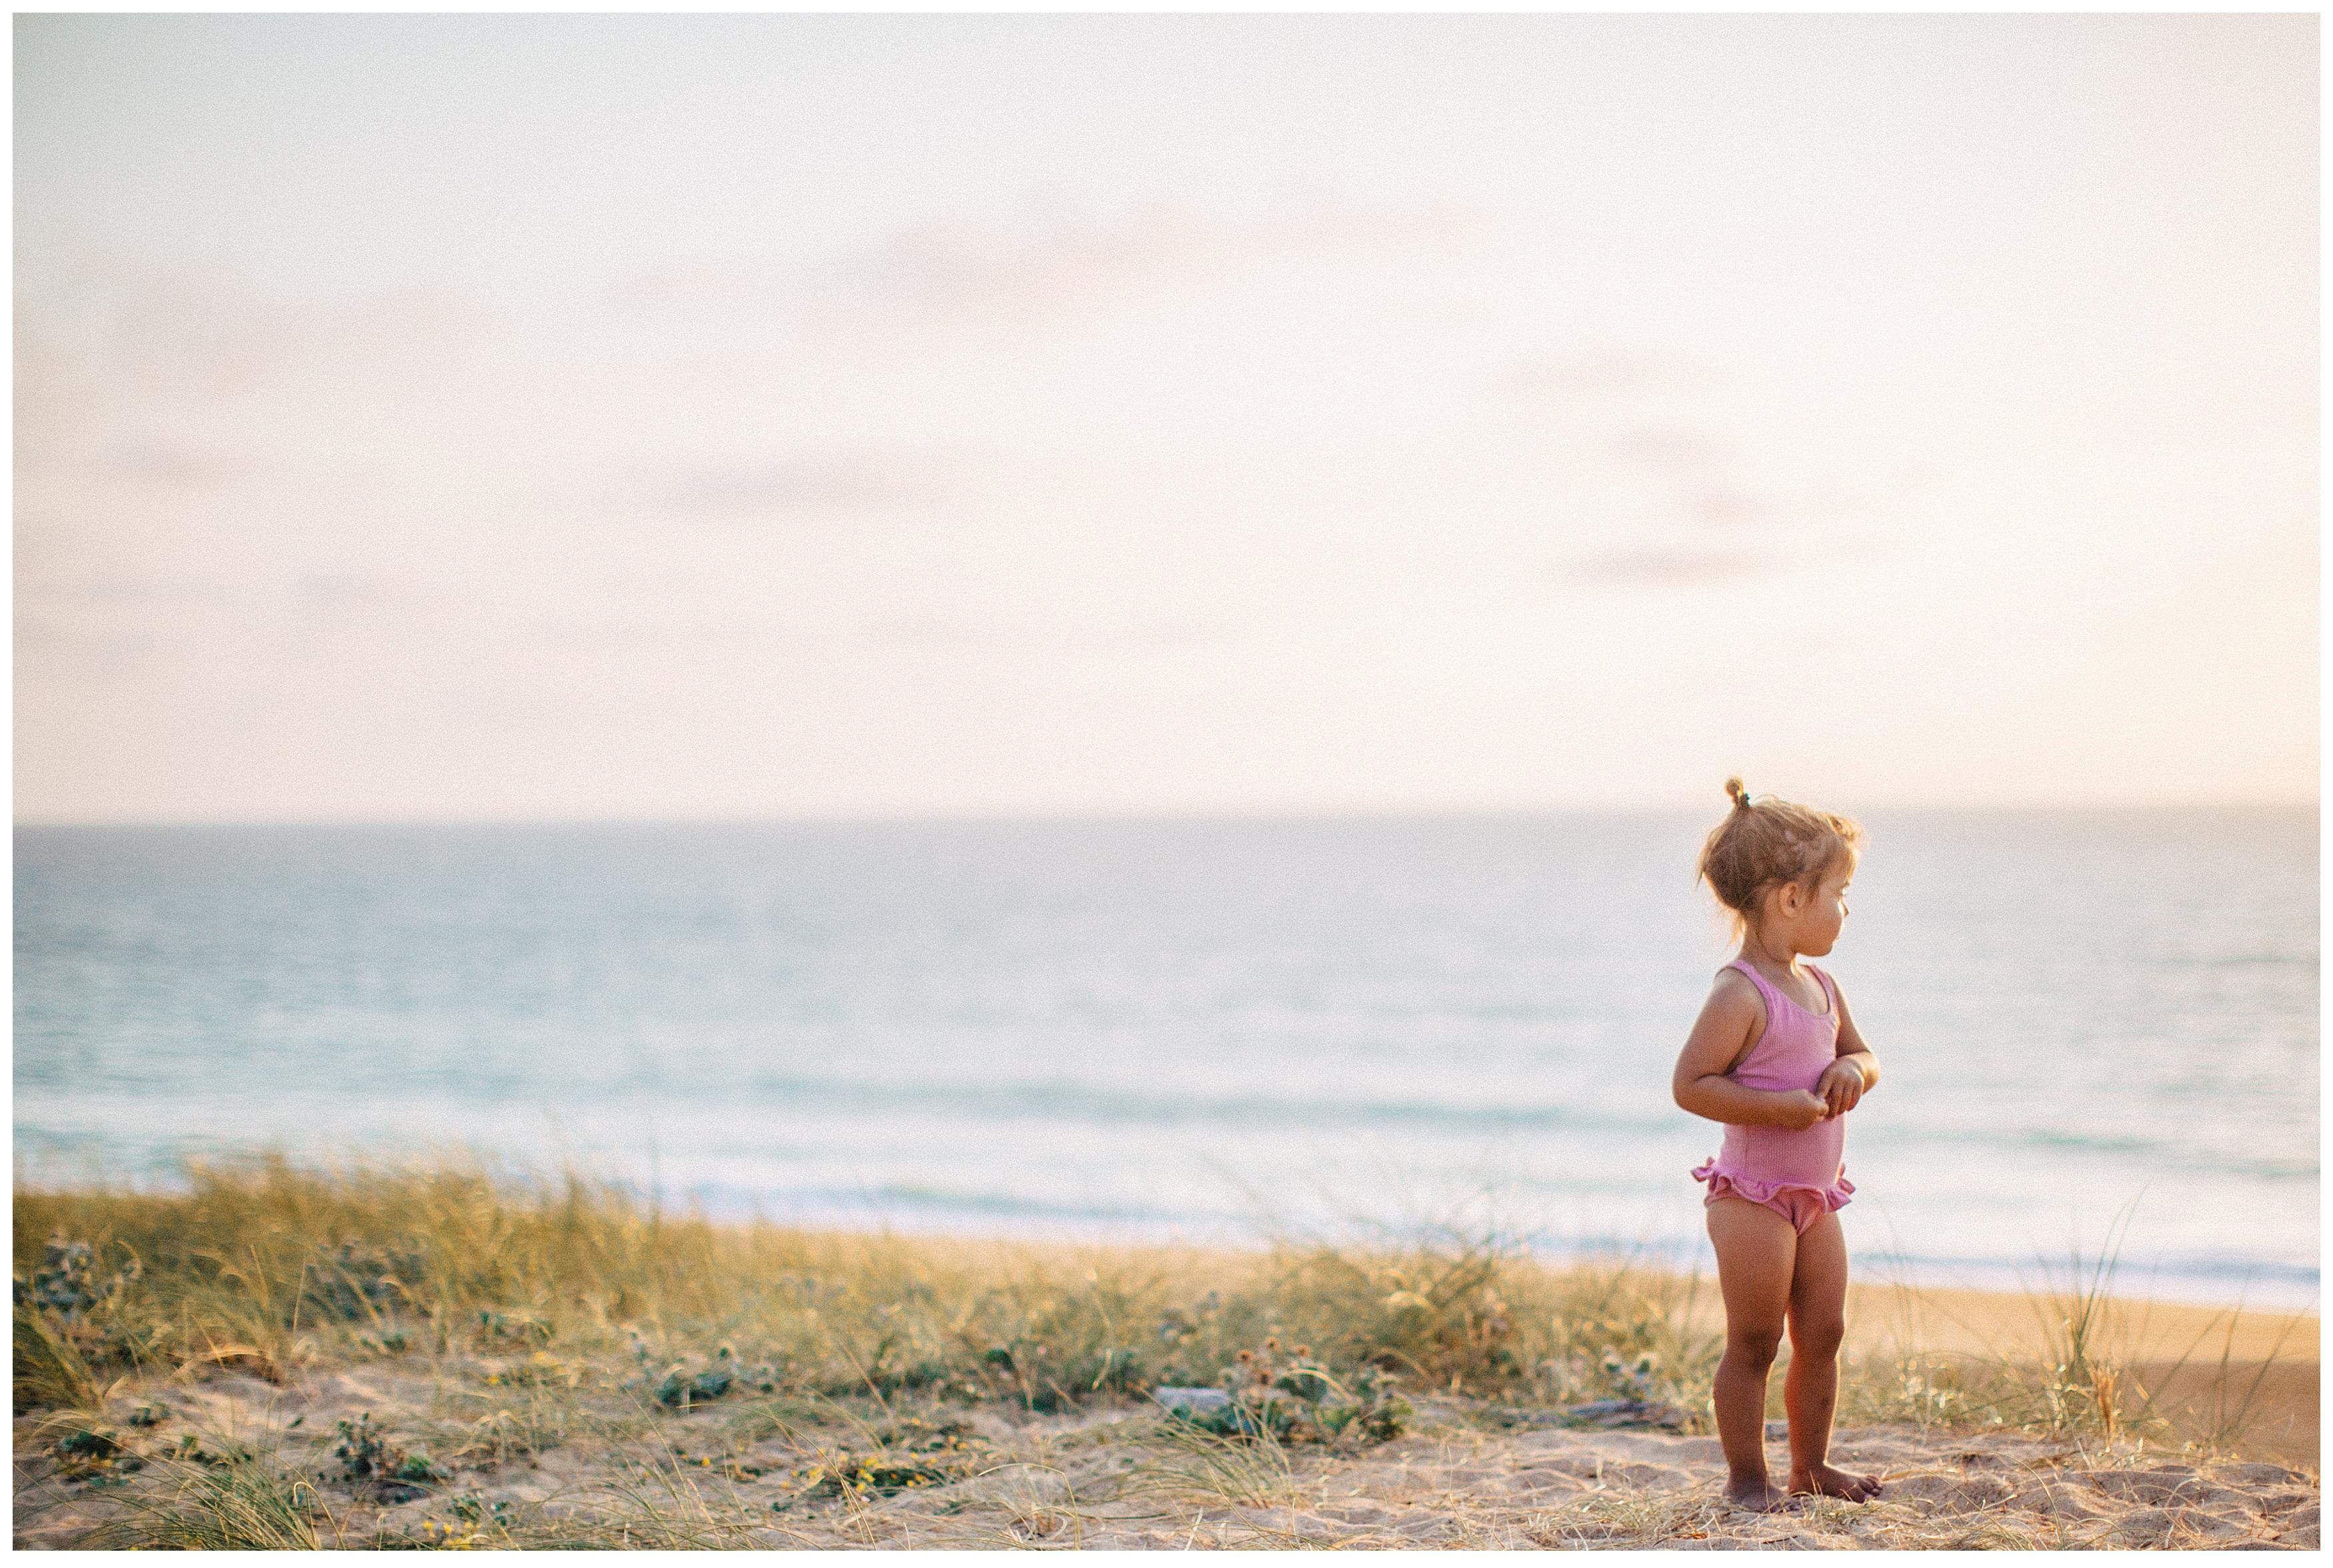 petite fille a l'ocean